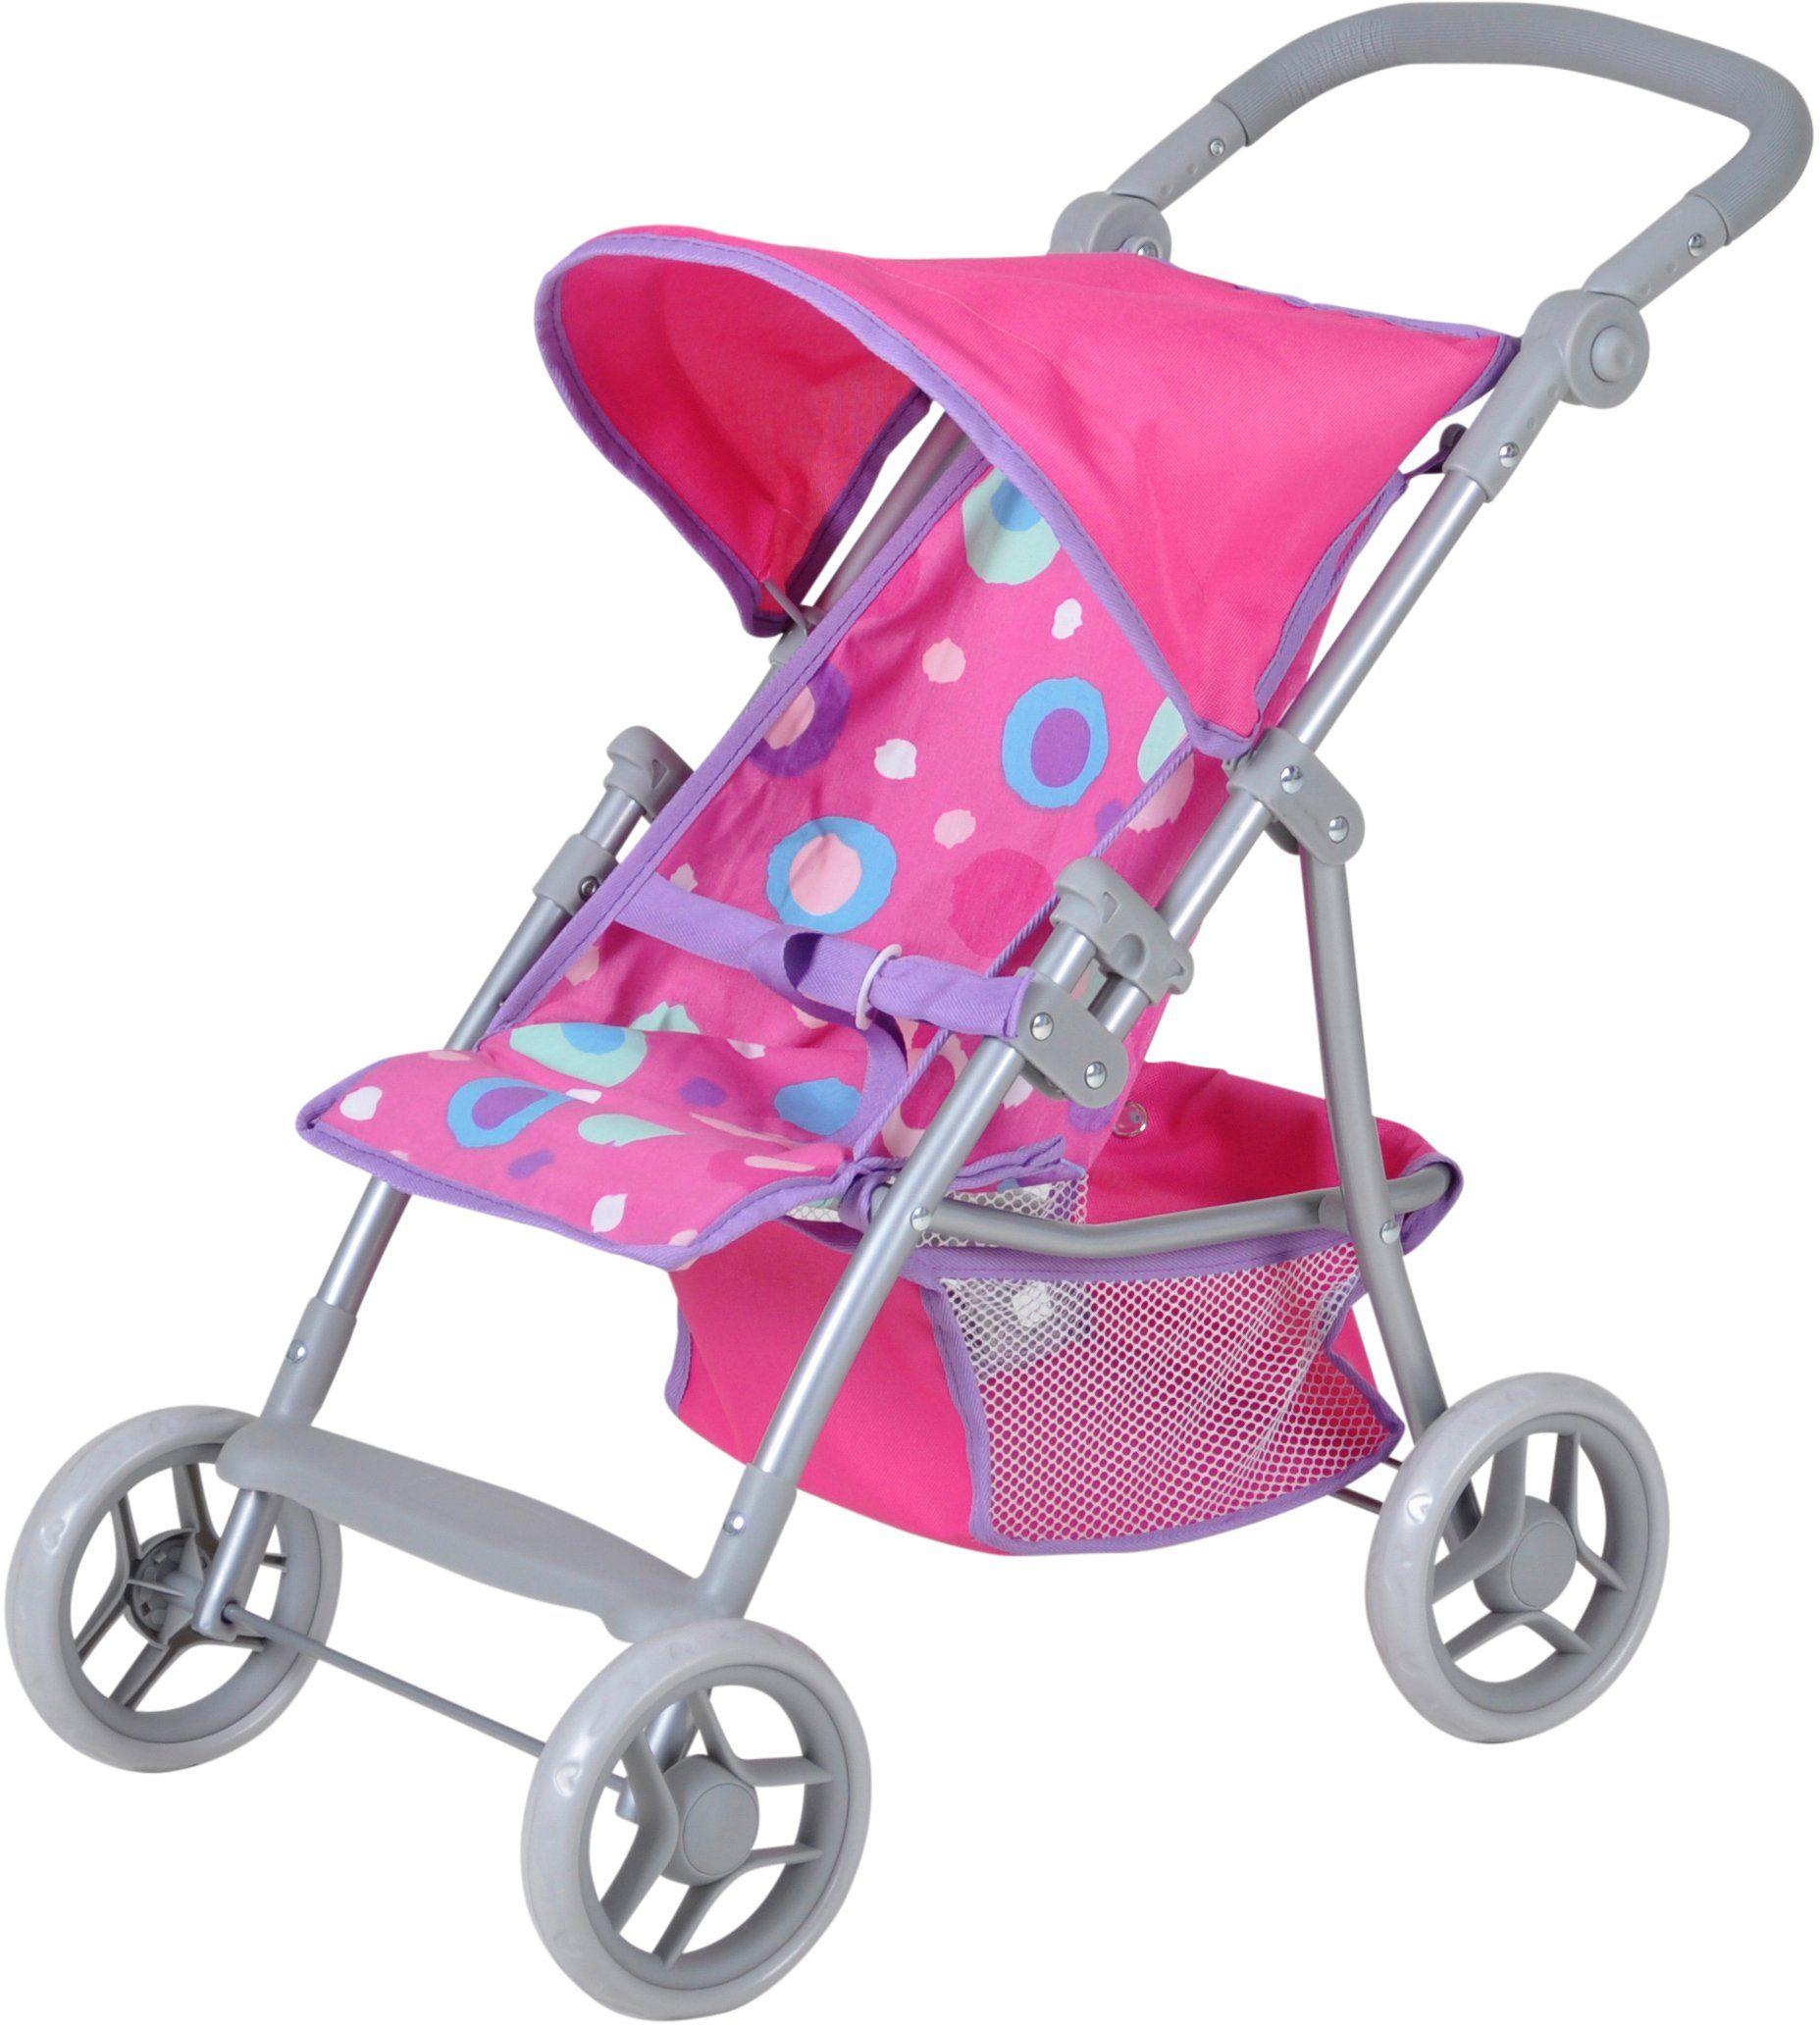 knorr toys Puppenbuggy, »Liba Pink Splash«